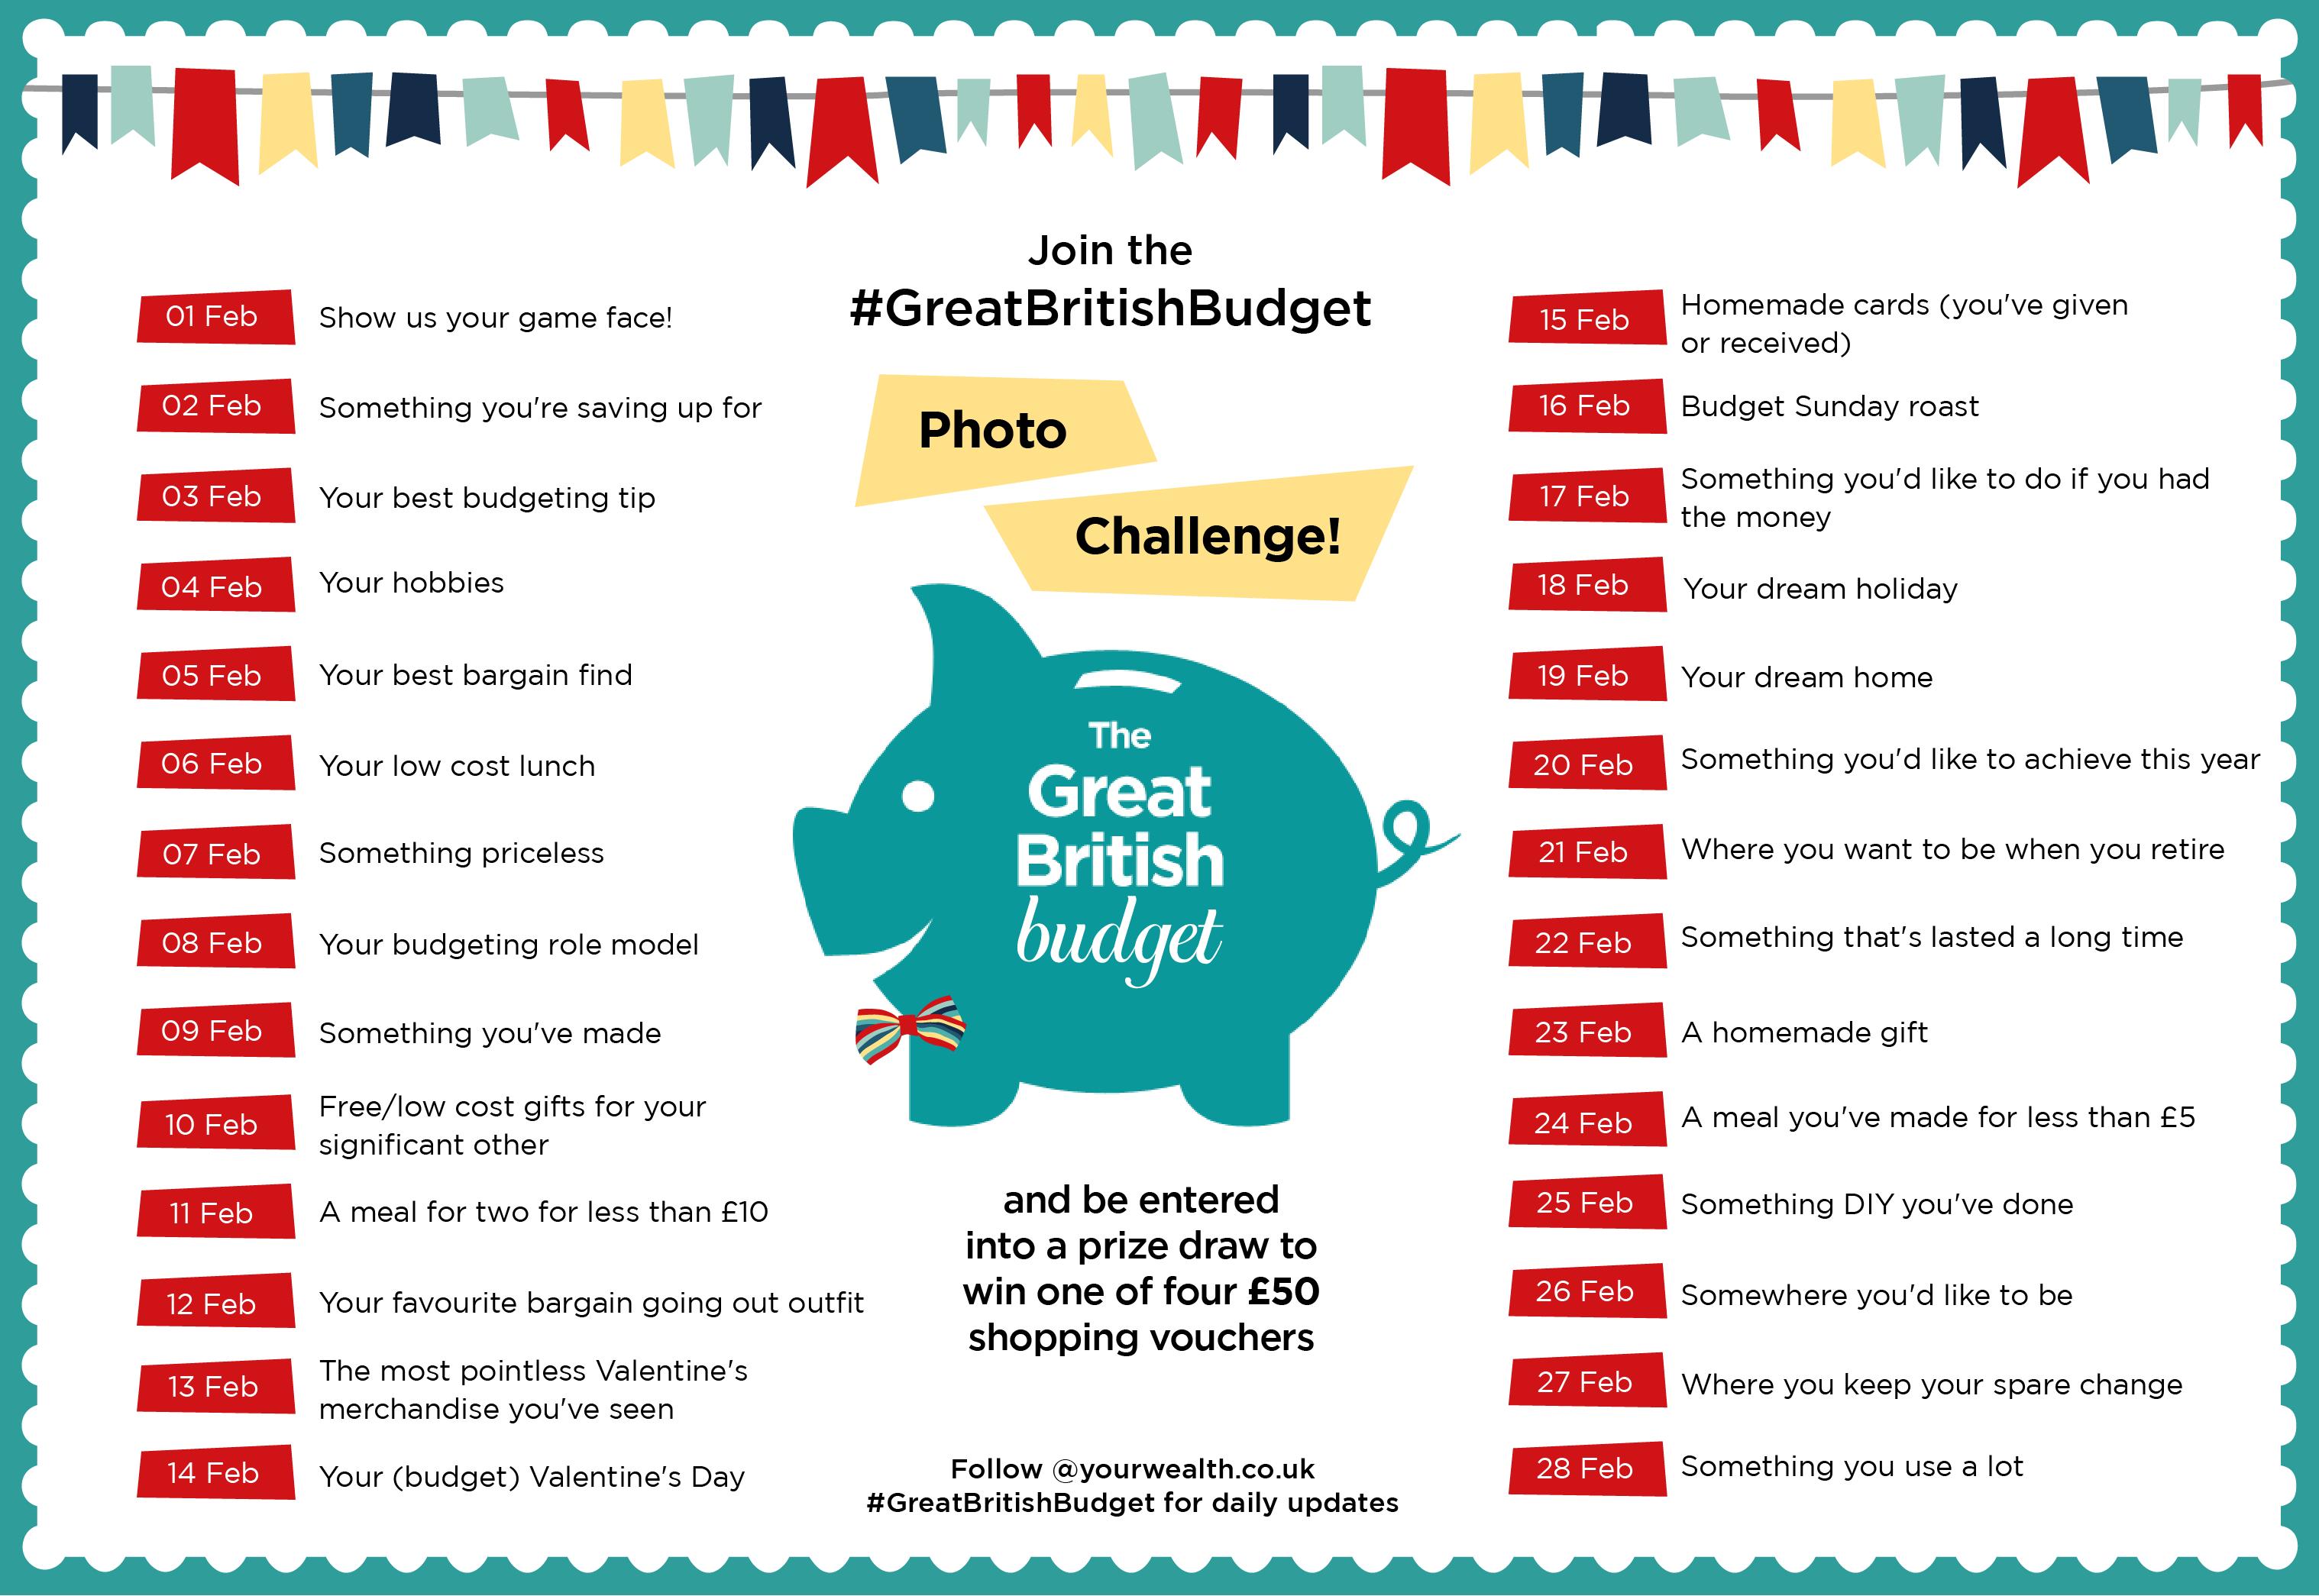 Great British Budget Feb Photo Challenge